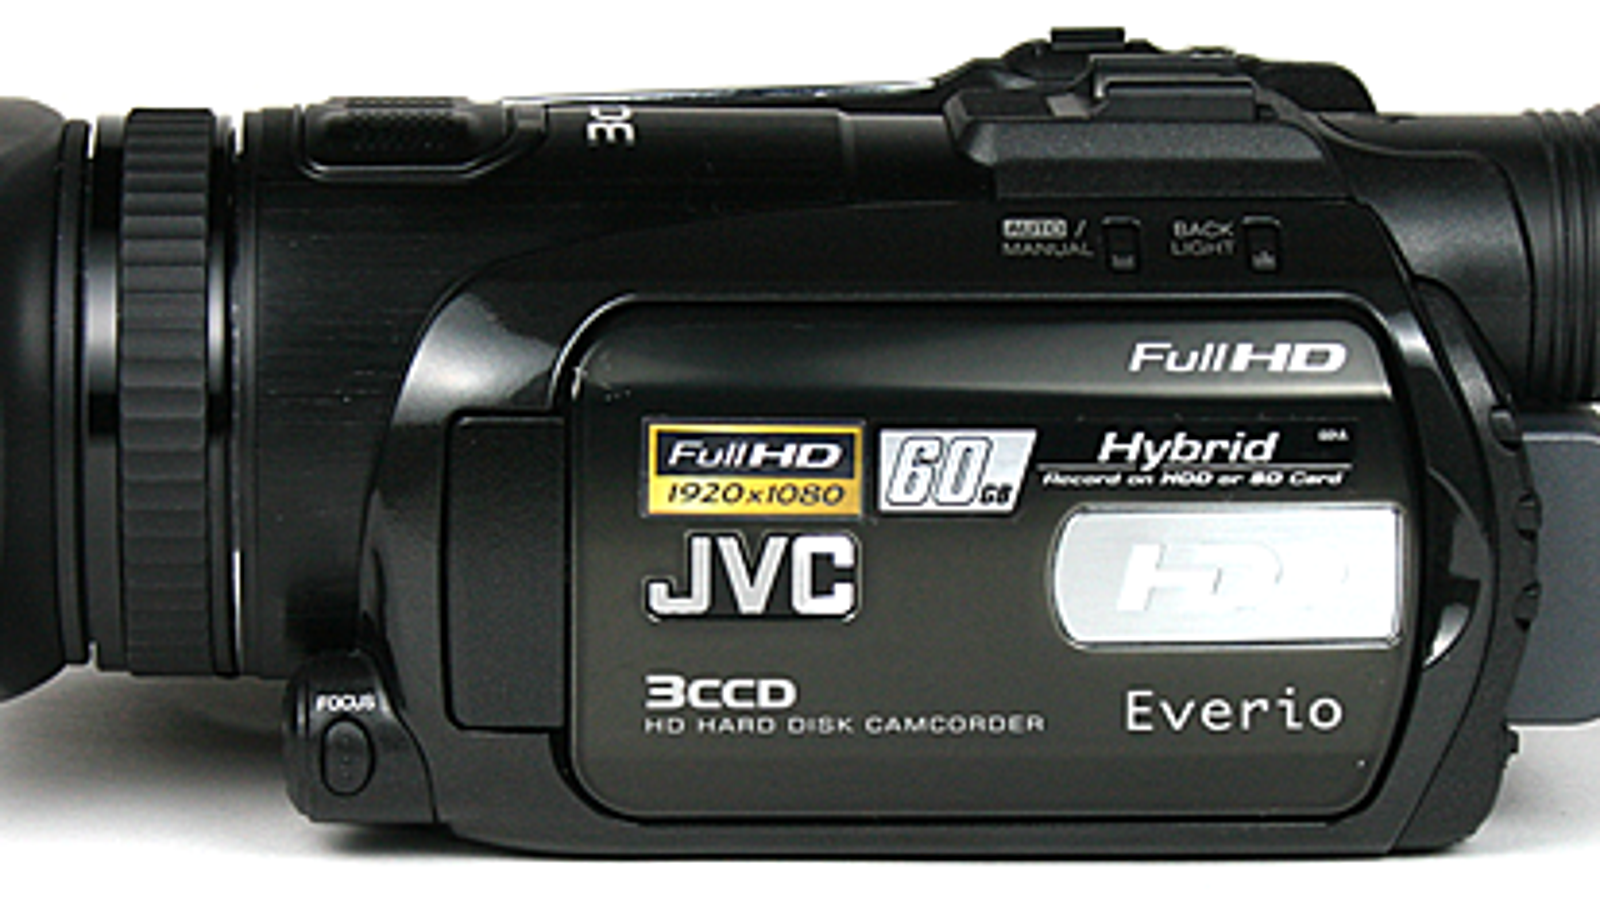 Jvc gz-hd7 manual.